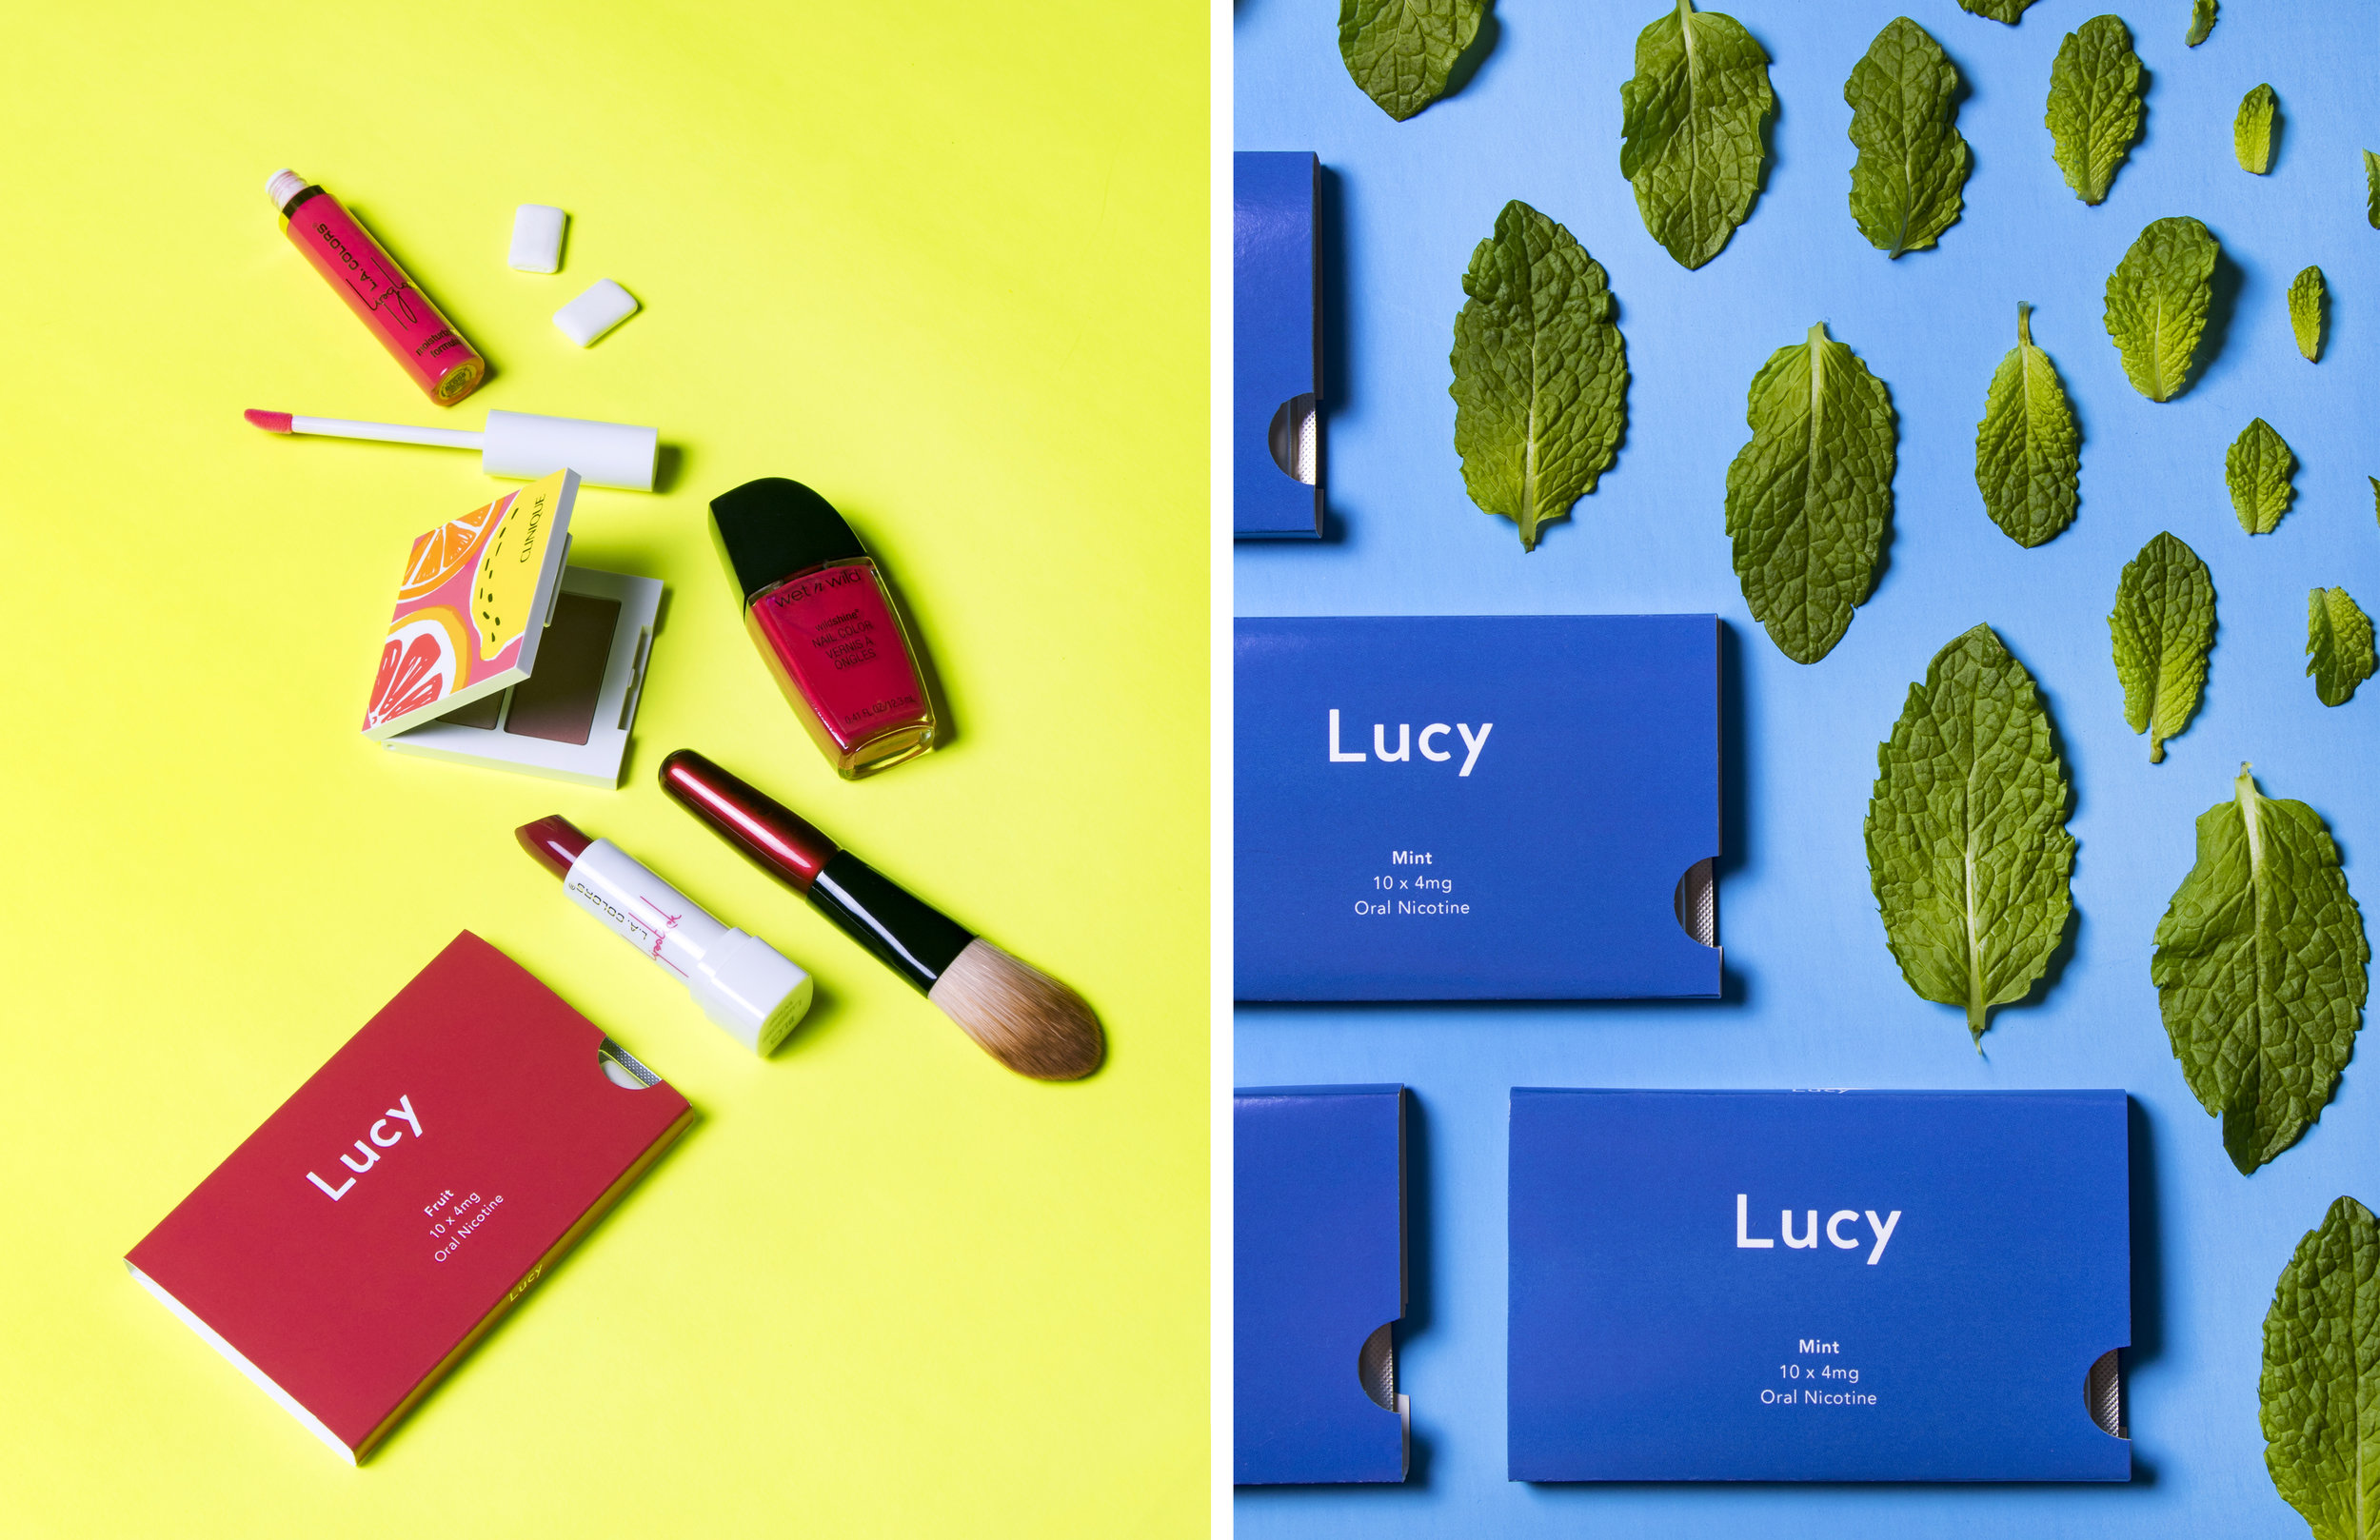 Product Photography | Lucy Gum | Allison McAdams Photography 3.jpg